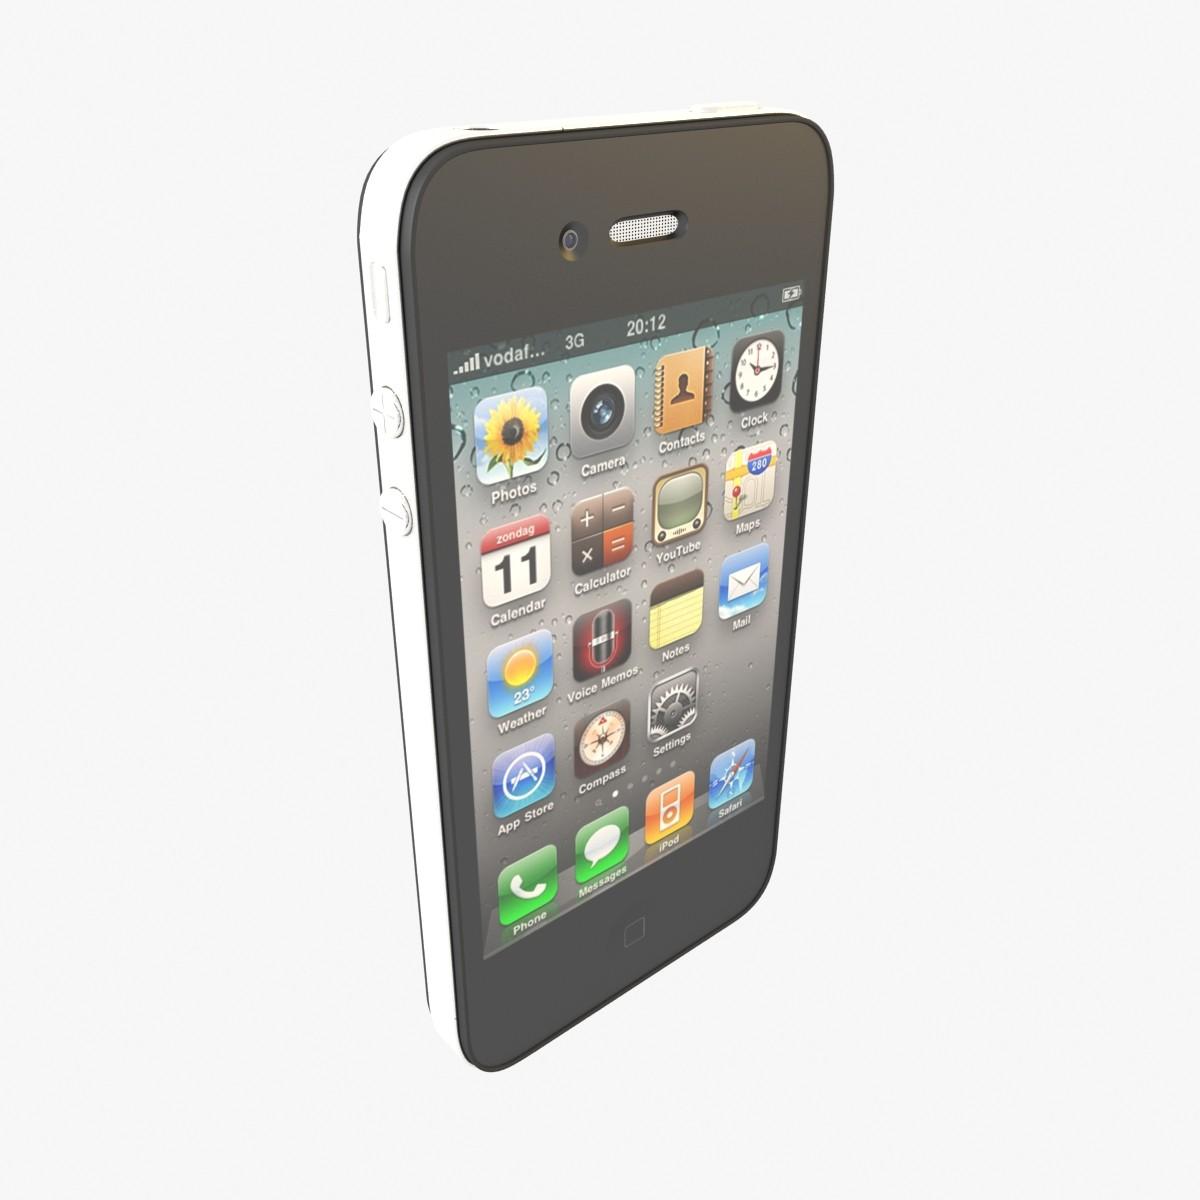 Apple iPhone 4 GSM Signature Image.jpg